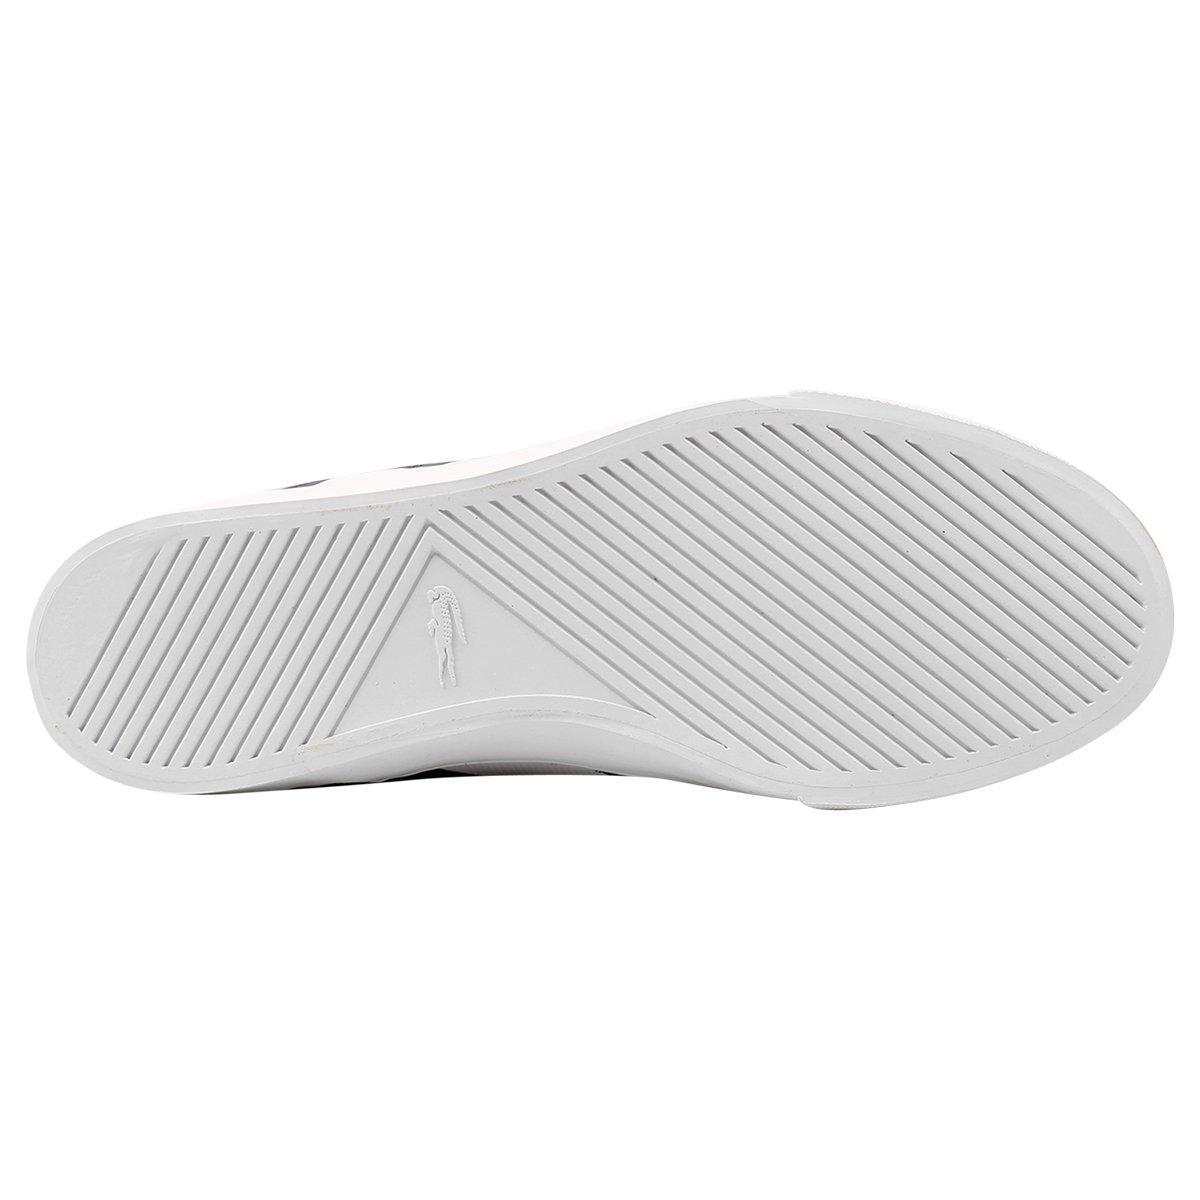 Tênis Lacoste Fairlead Rei - Marinho - Compre Agora   Netshoes 49b6f50559